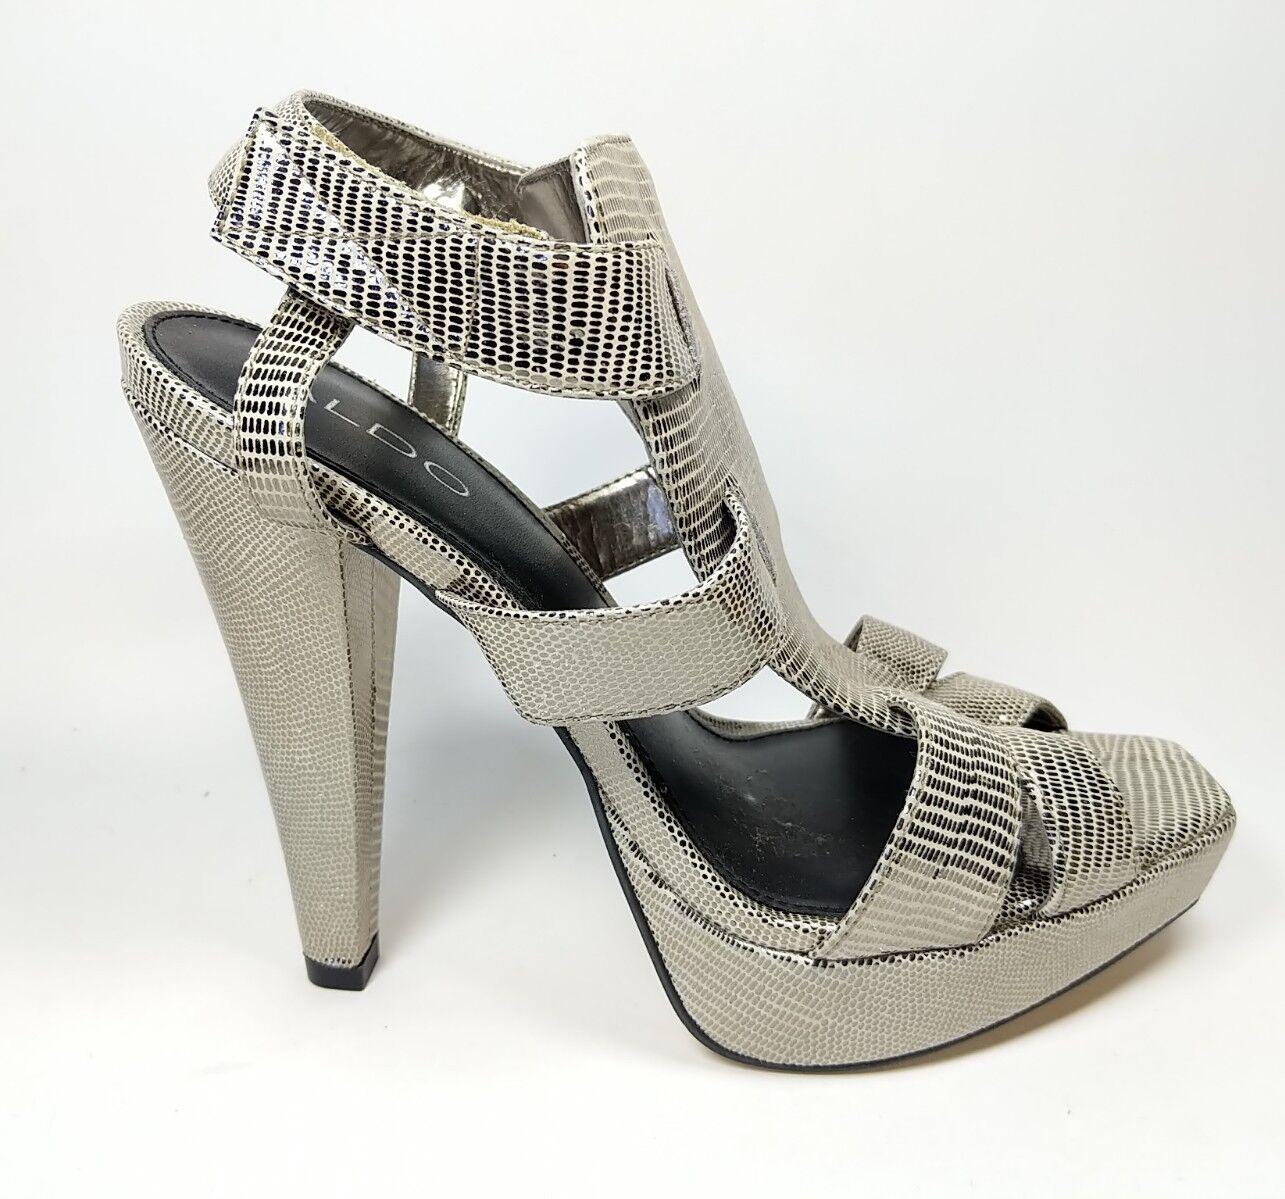 Aldo silver leather open toe high heel shoes uk 6 eu 39 super condition